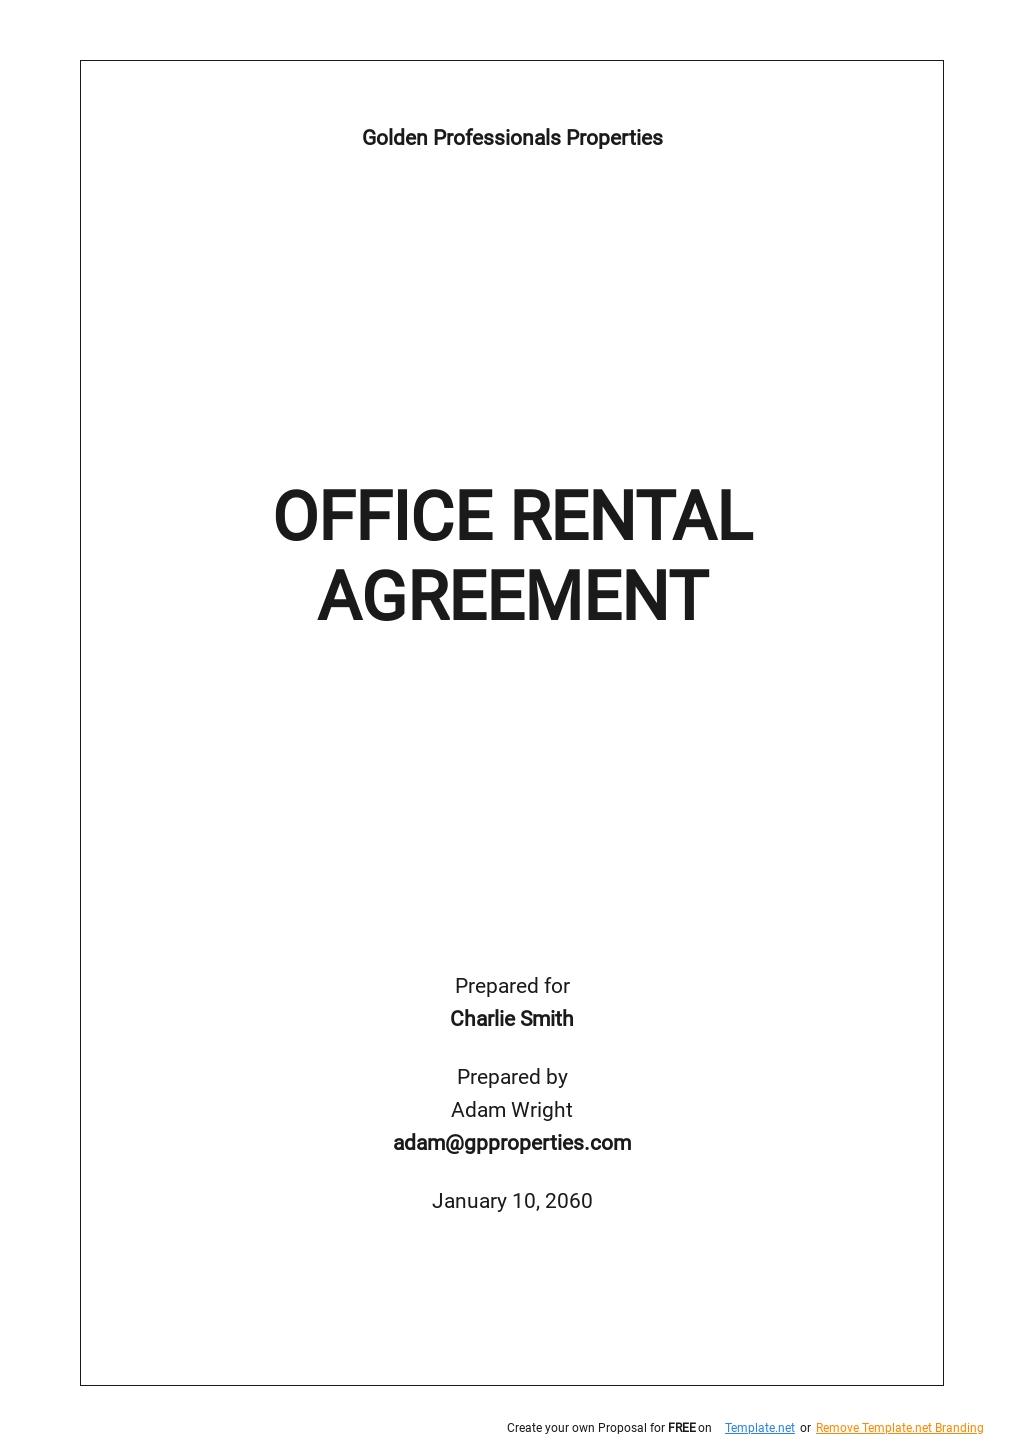 Free Office Rental Agreement Template .jpe